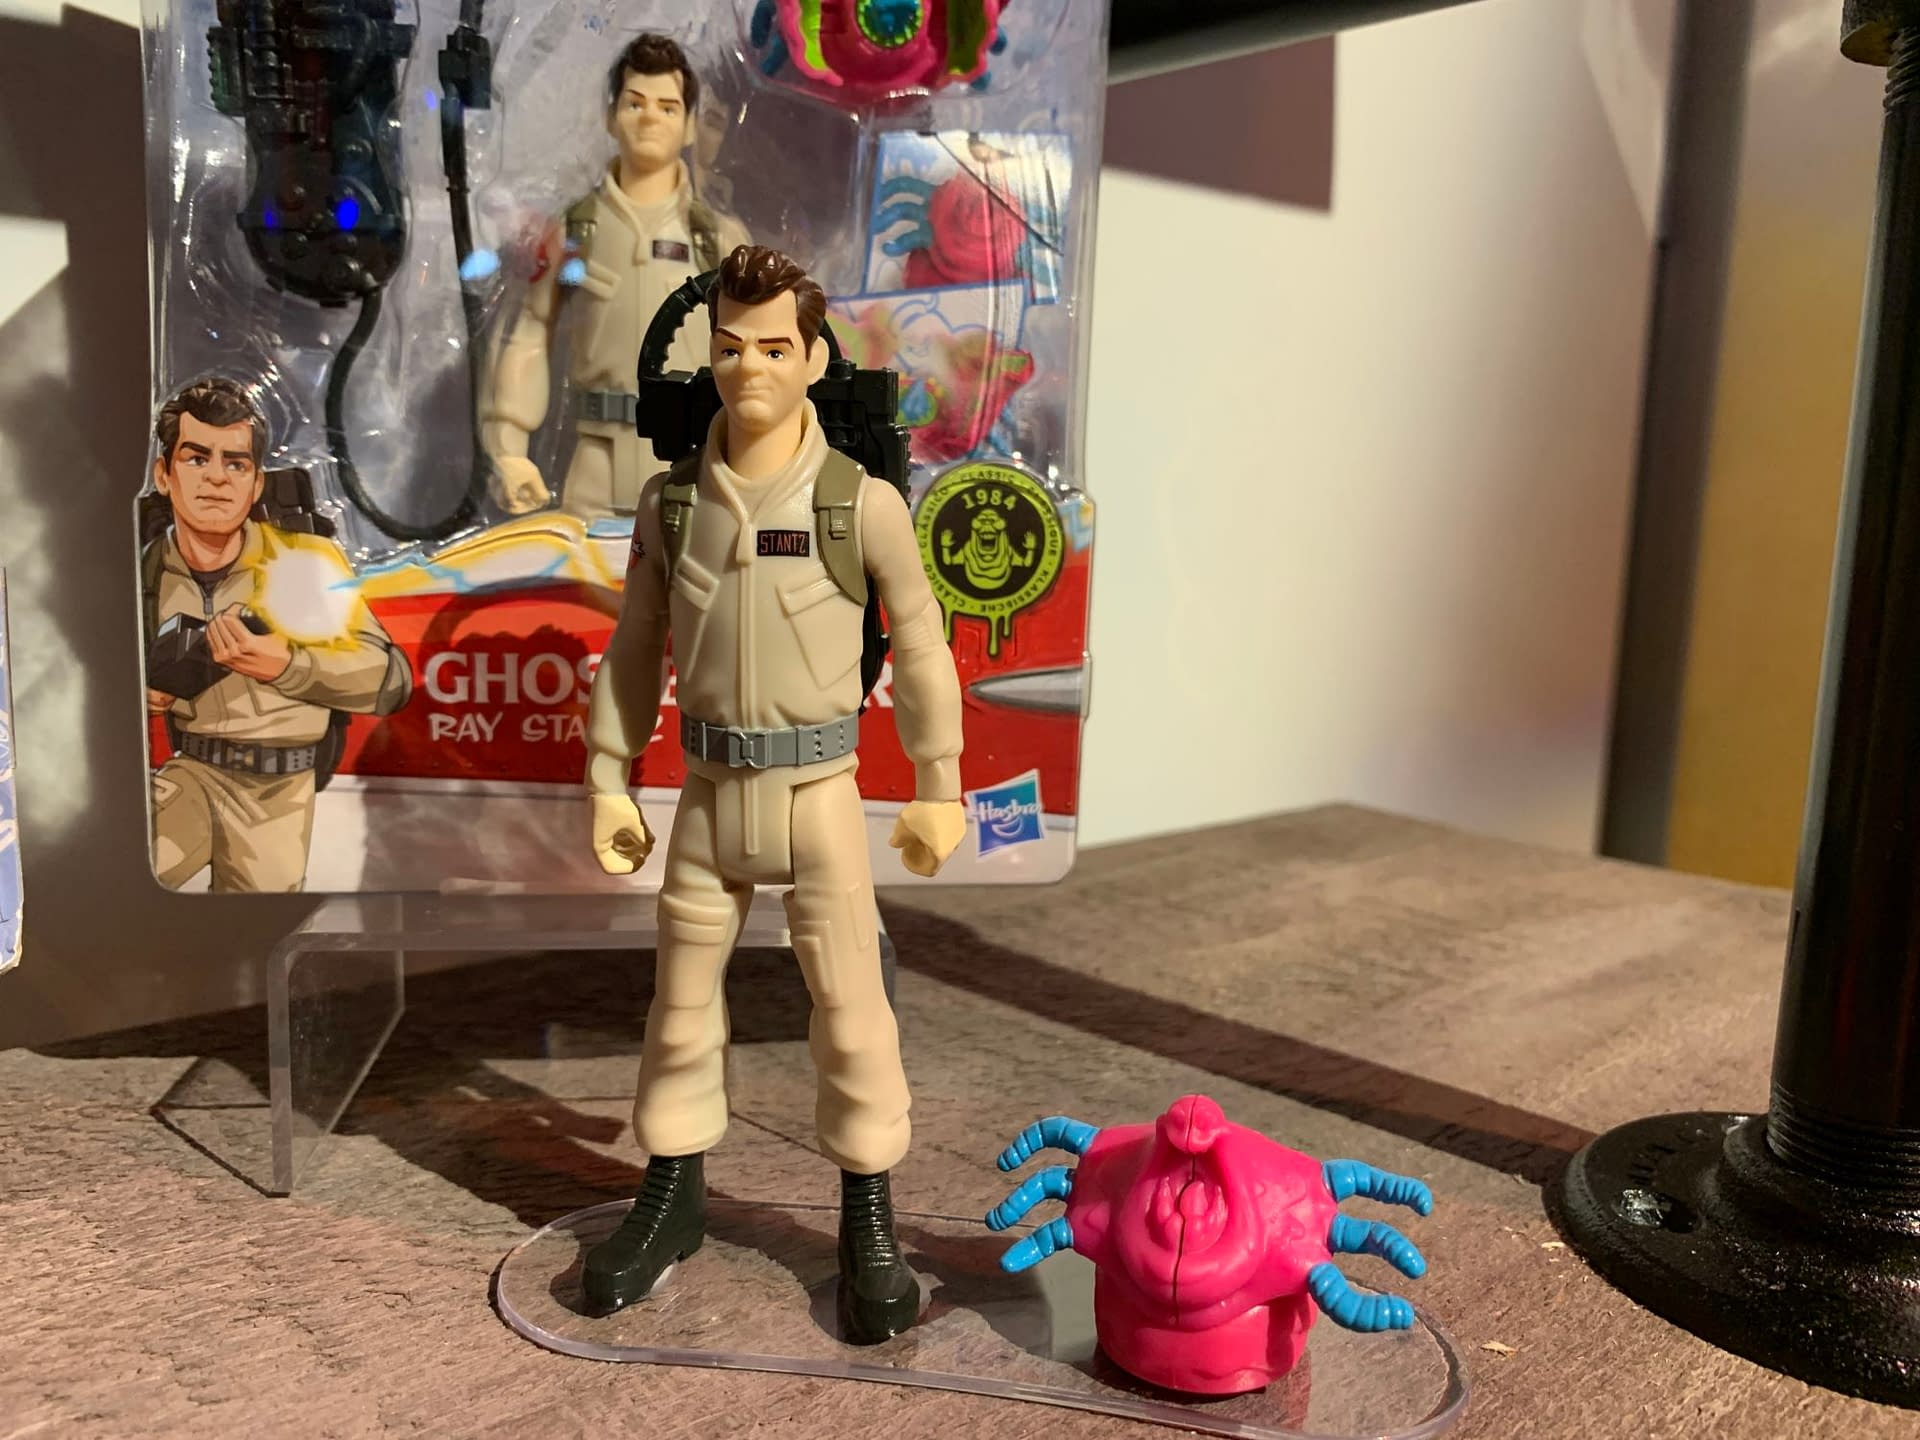 Hasbro New York Toy Fair 2020 - Ghostbuster Booth